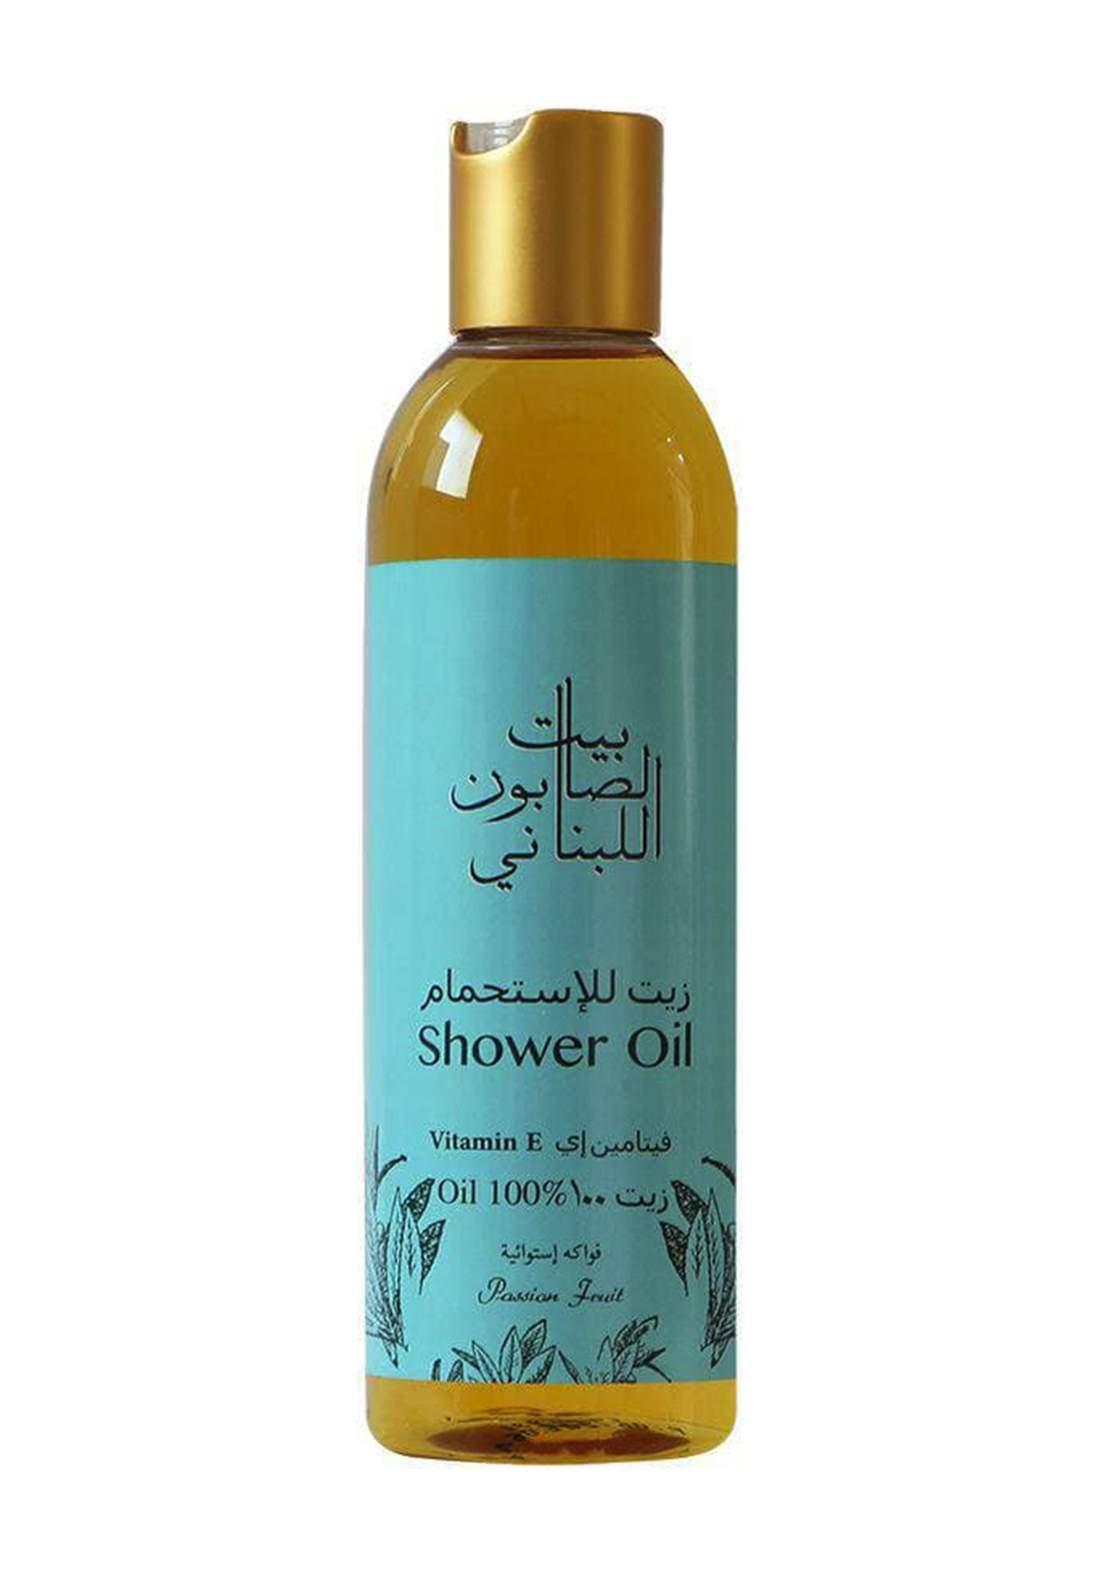 Bayt Alsaboun Alloubnani-317484 Shower Oil Vitamen E Passion Fruit 250ml زيت الاستحمام